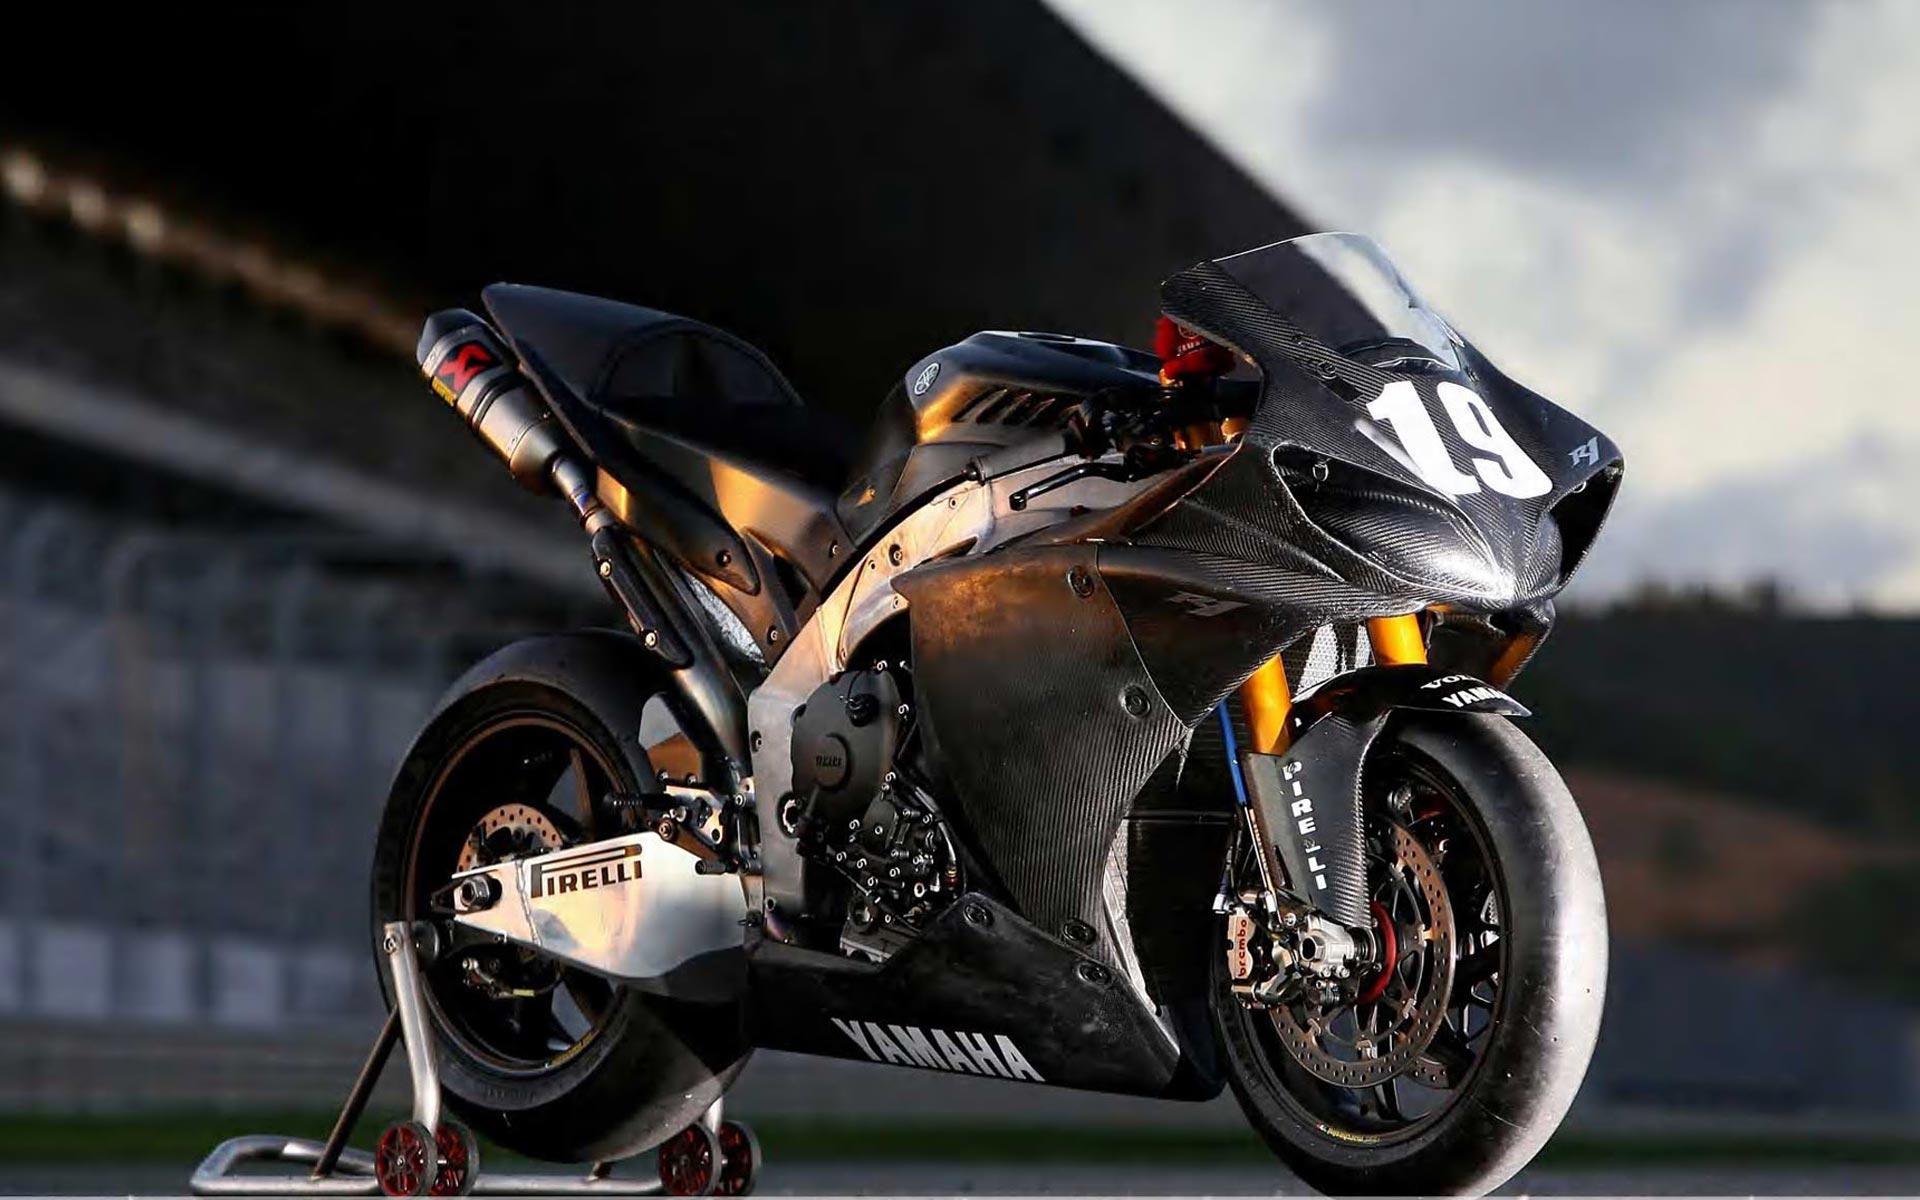 Yamaha YZF R1 Pirelli hd Wallpaper High Quality WallpapersWallpaper 1920x1200